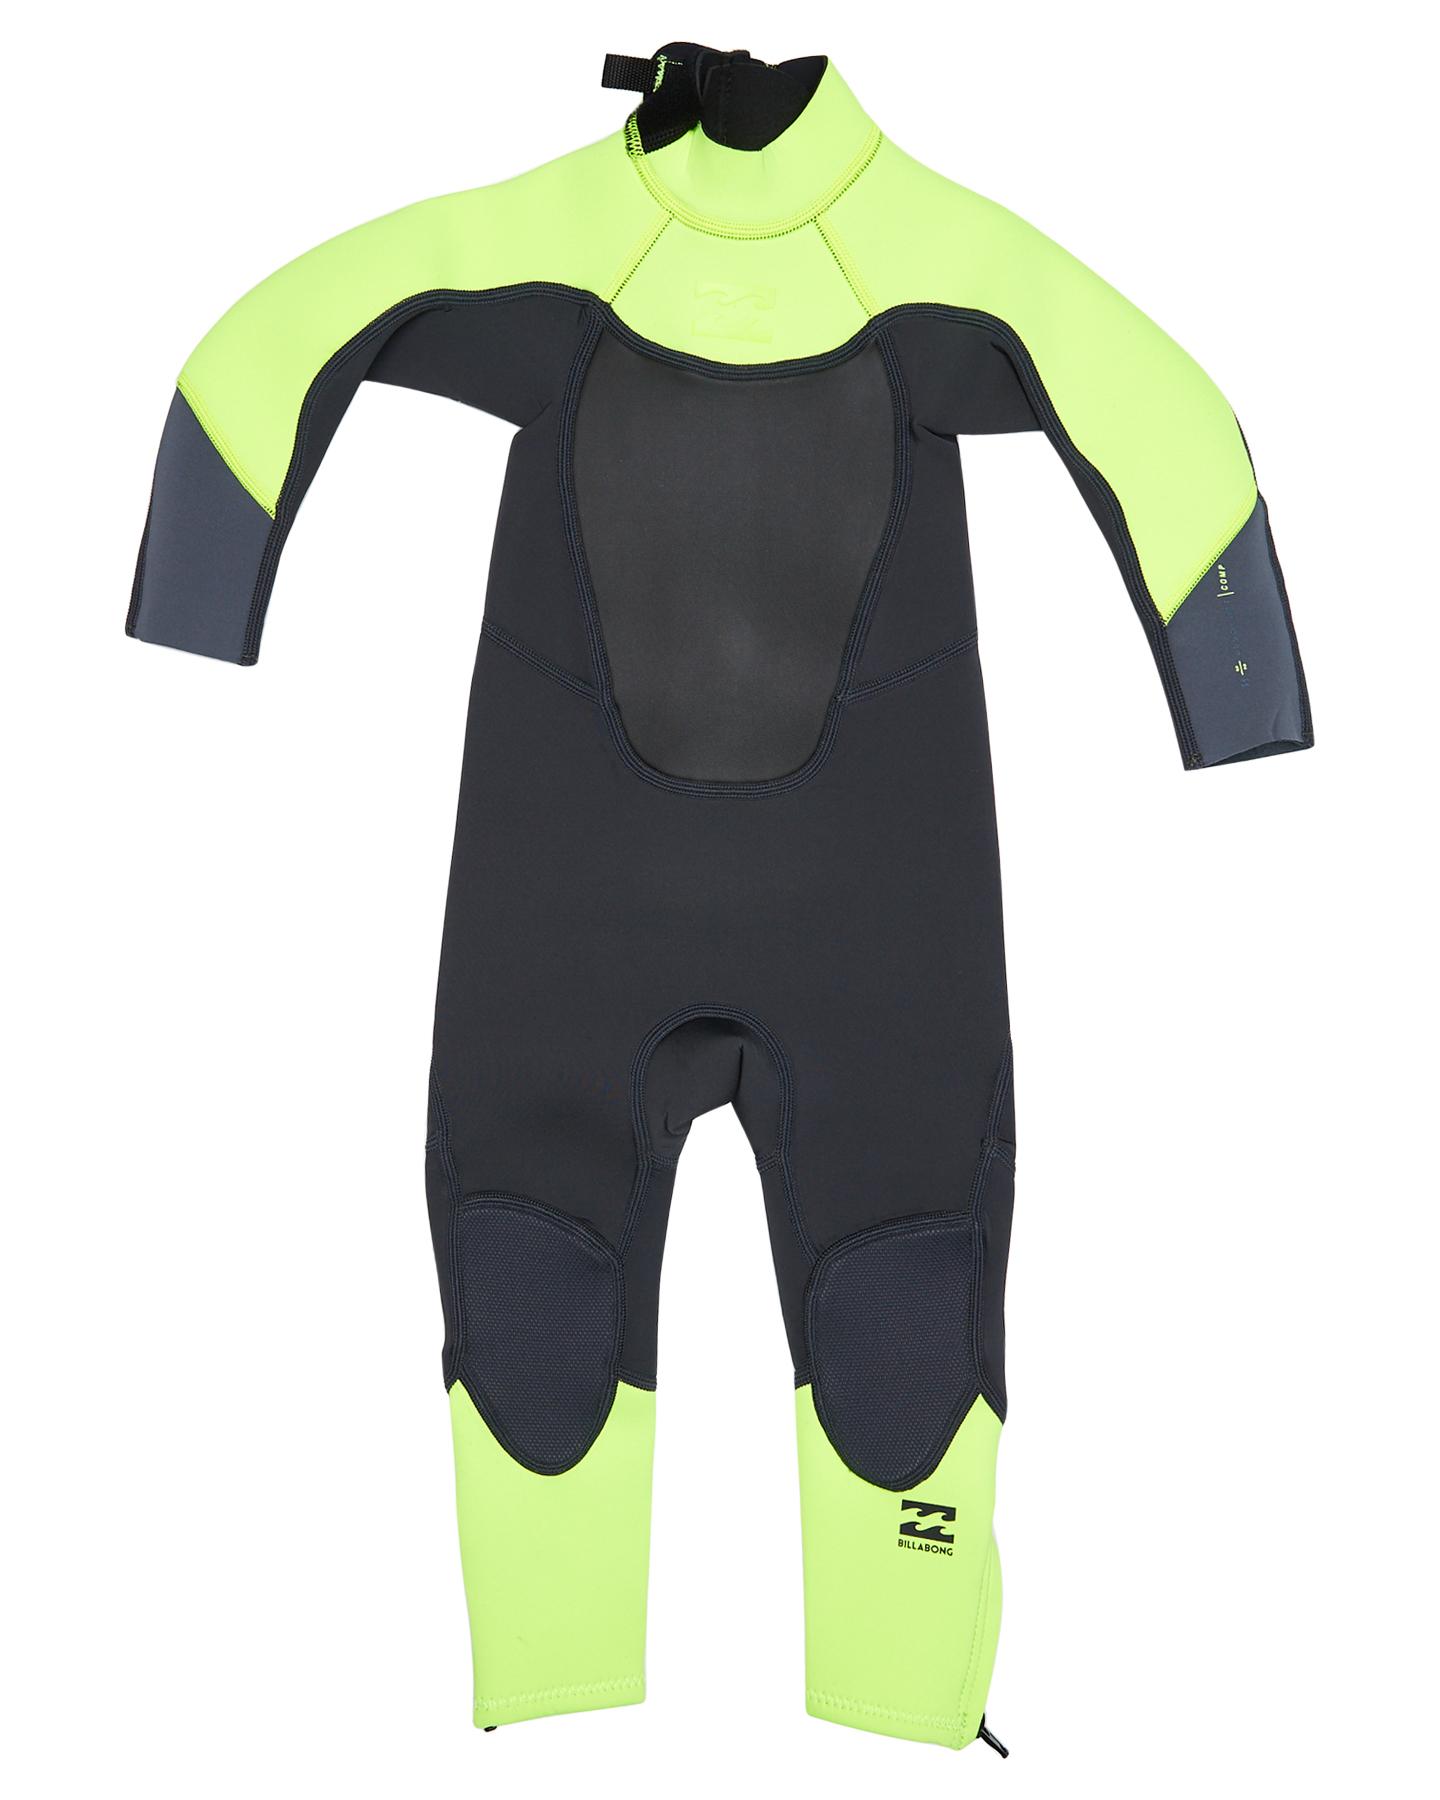 d0f4eebb20 Todler   kids wetsuit (2-7 years) 3 2 Billabong Absolute Comp backzip